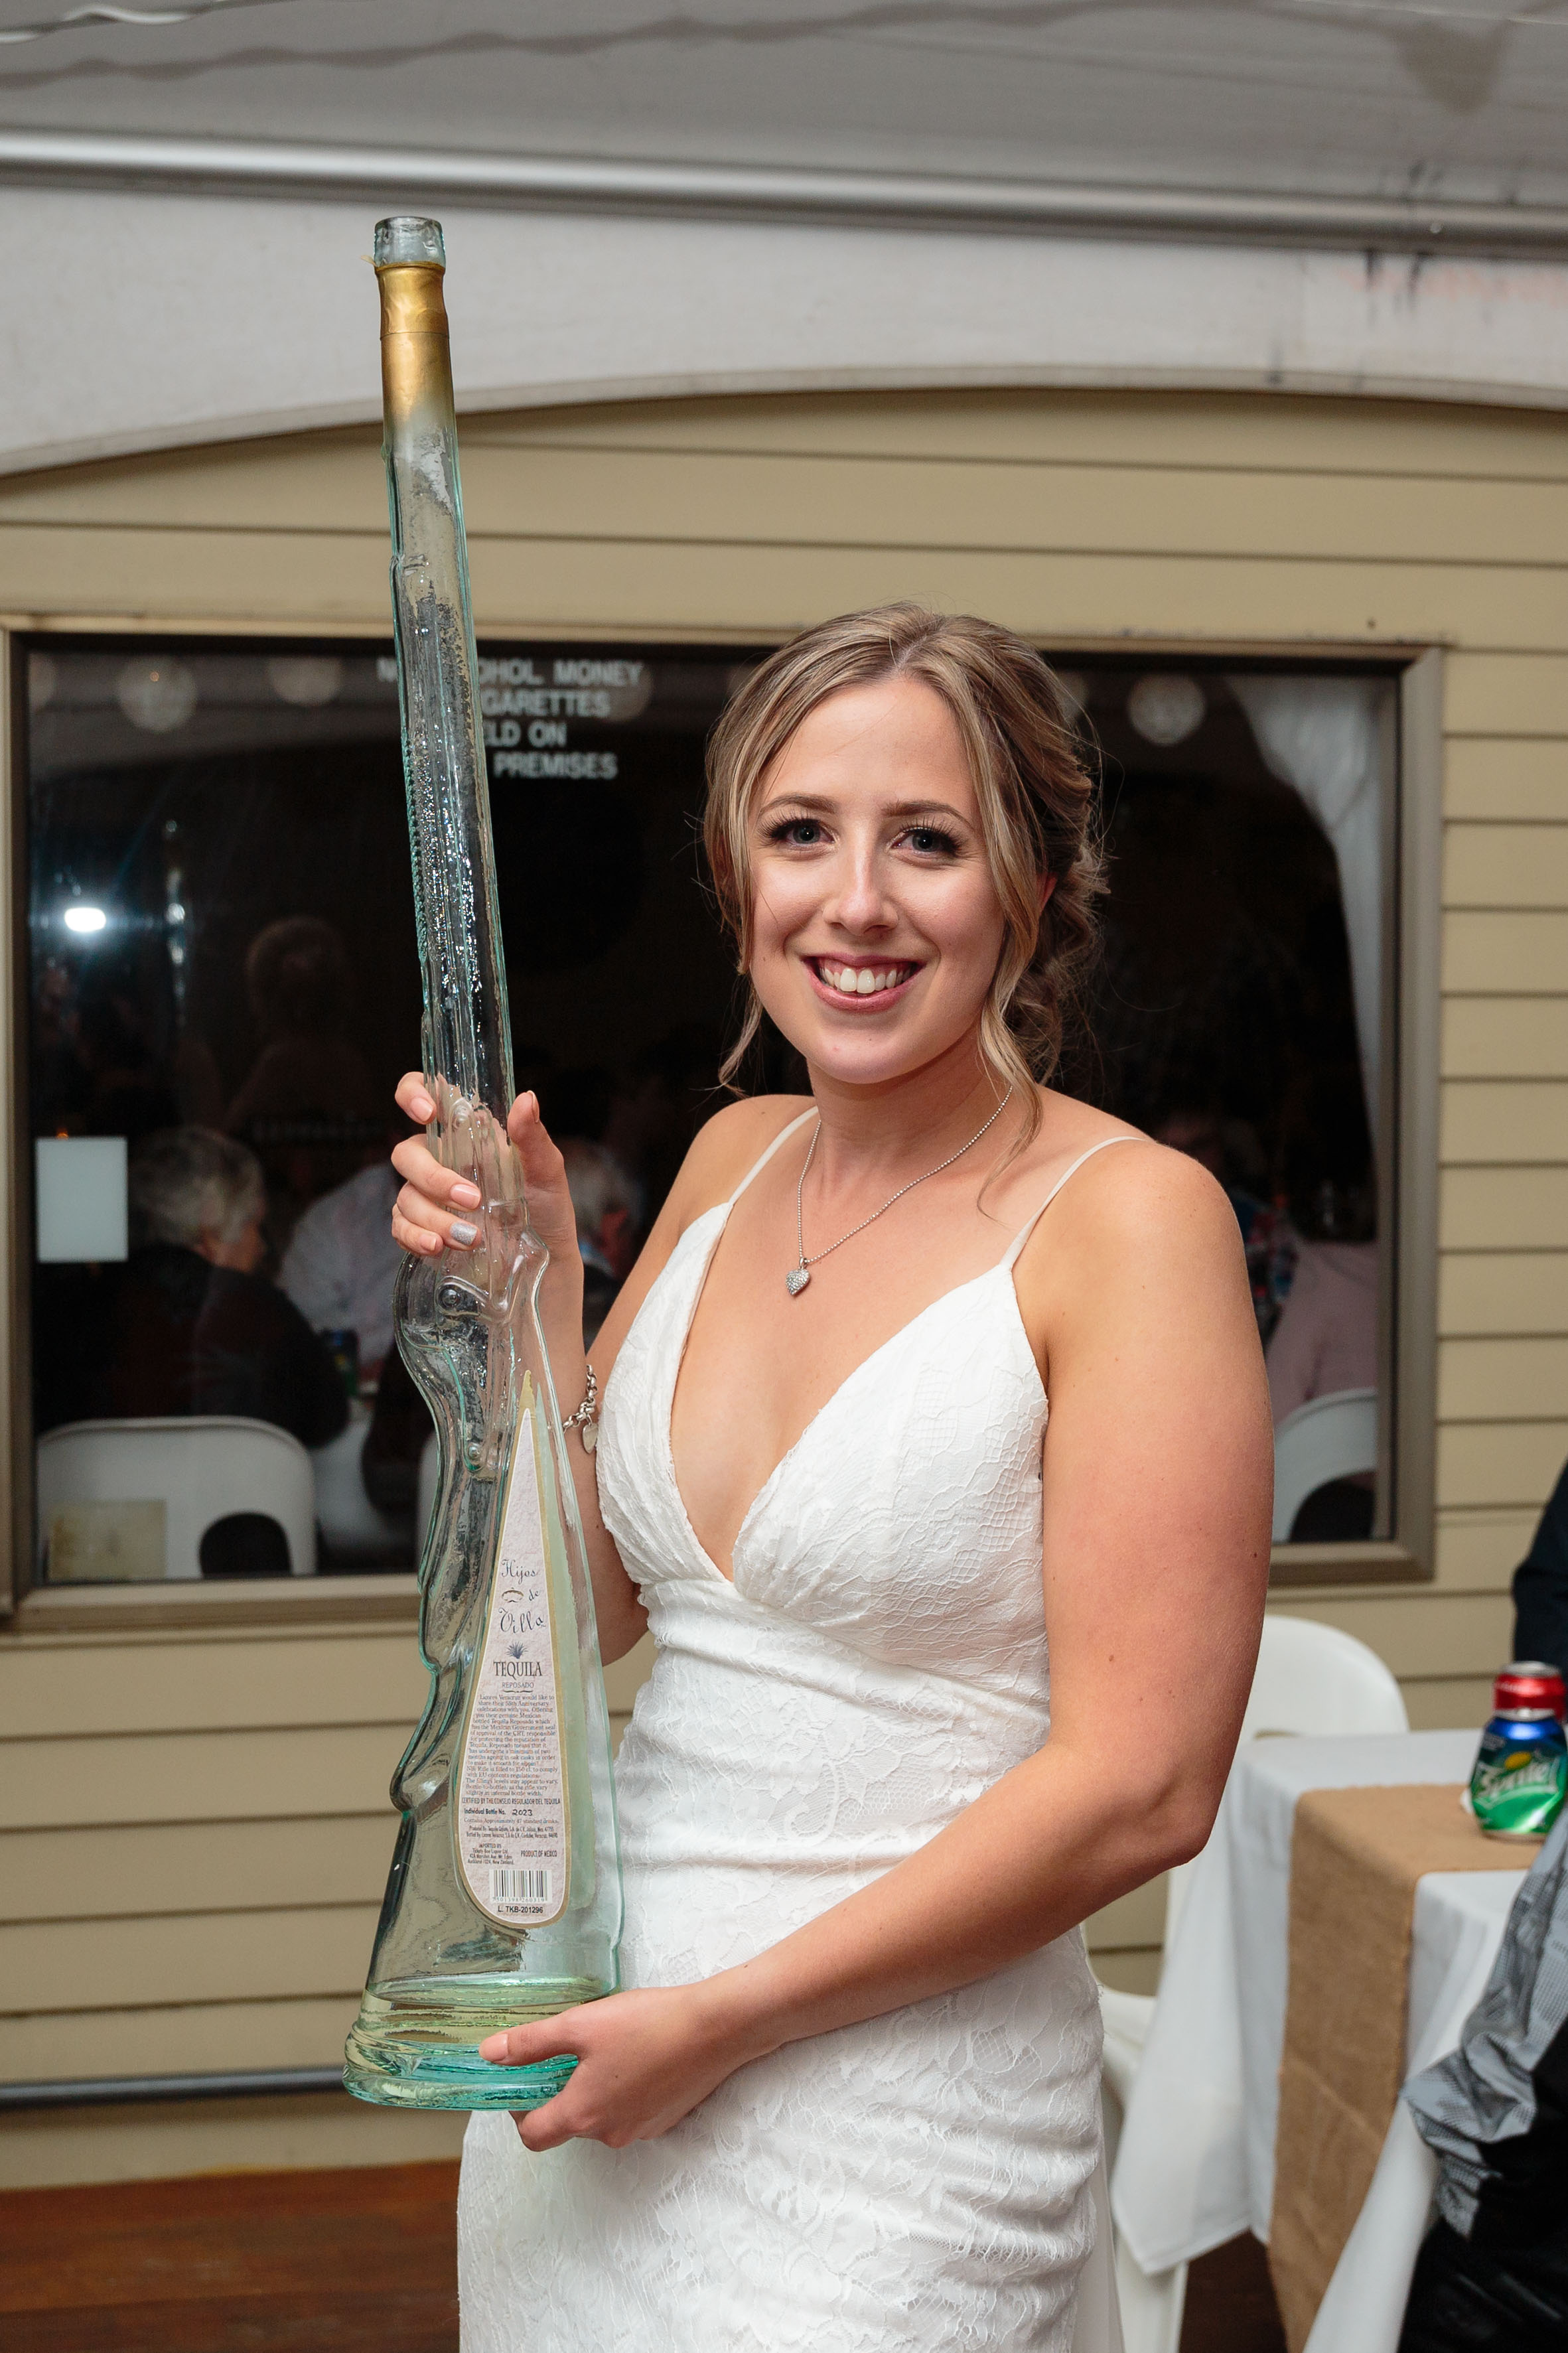 Highight-wedding-photography-dudding-lake-palmerston-north-new-zealand-88.jpg